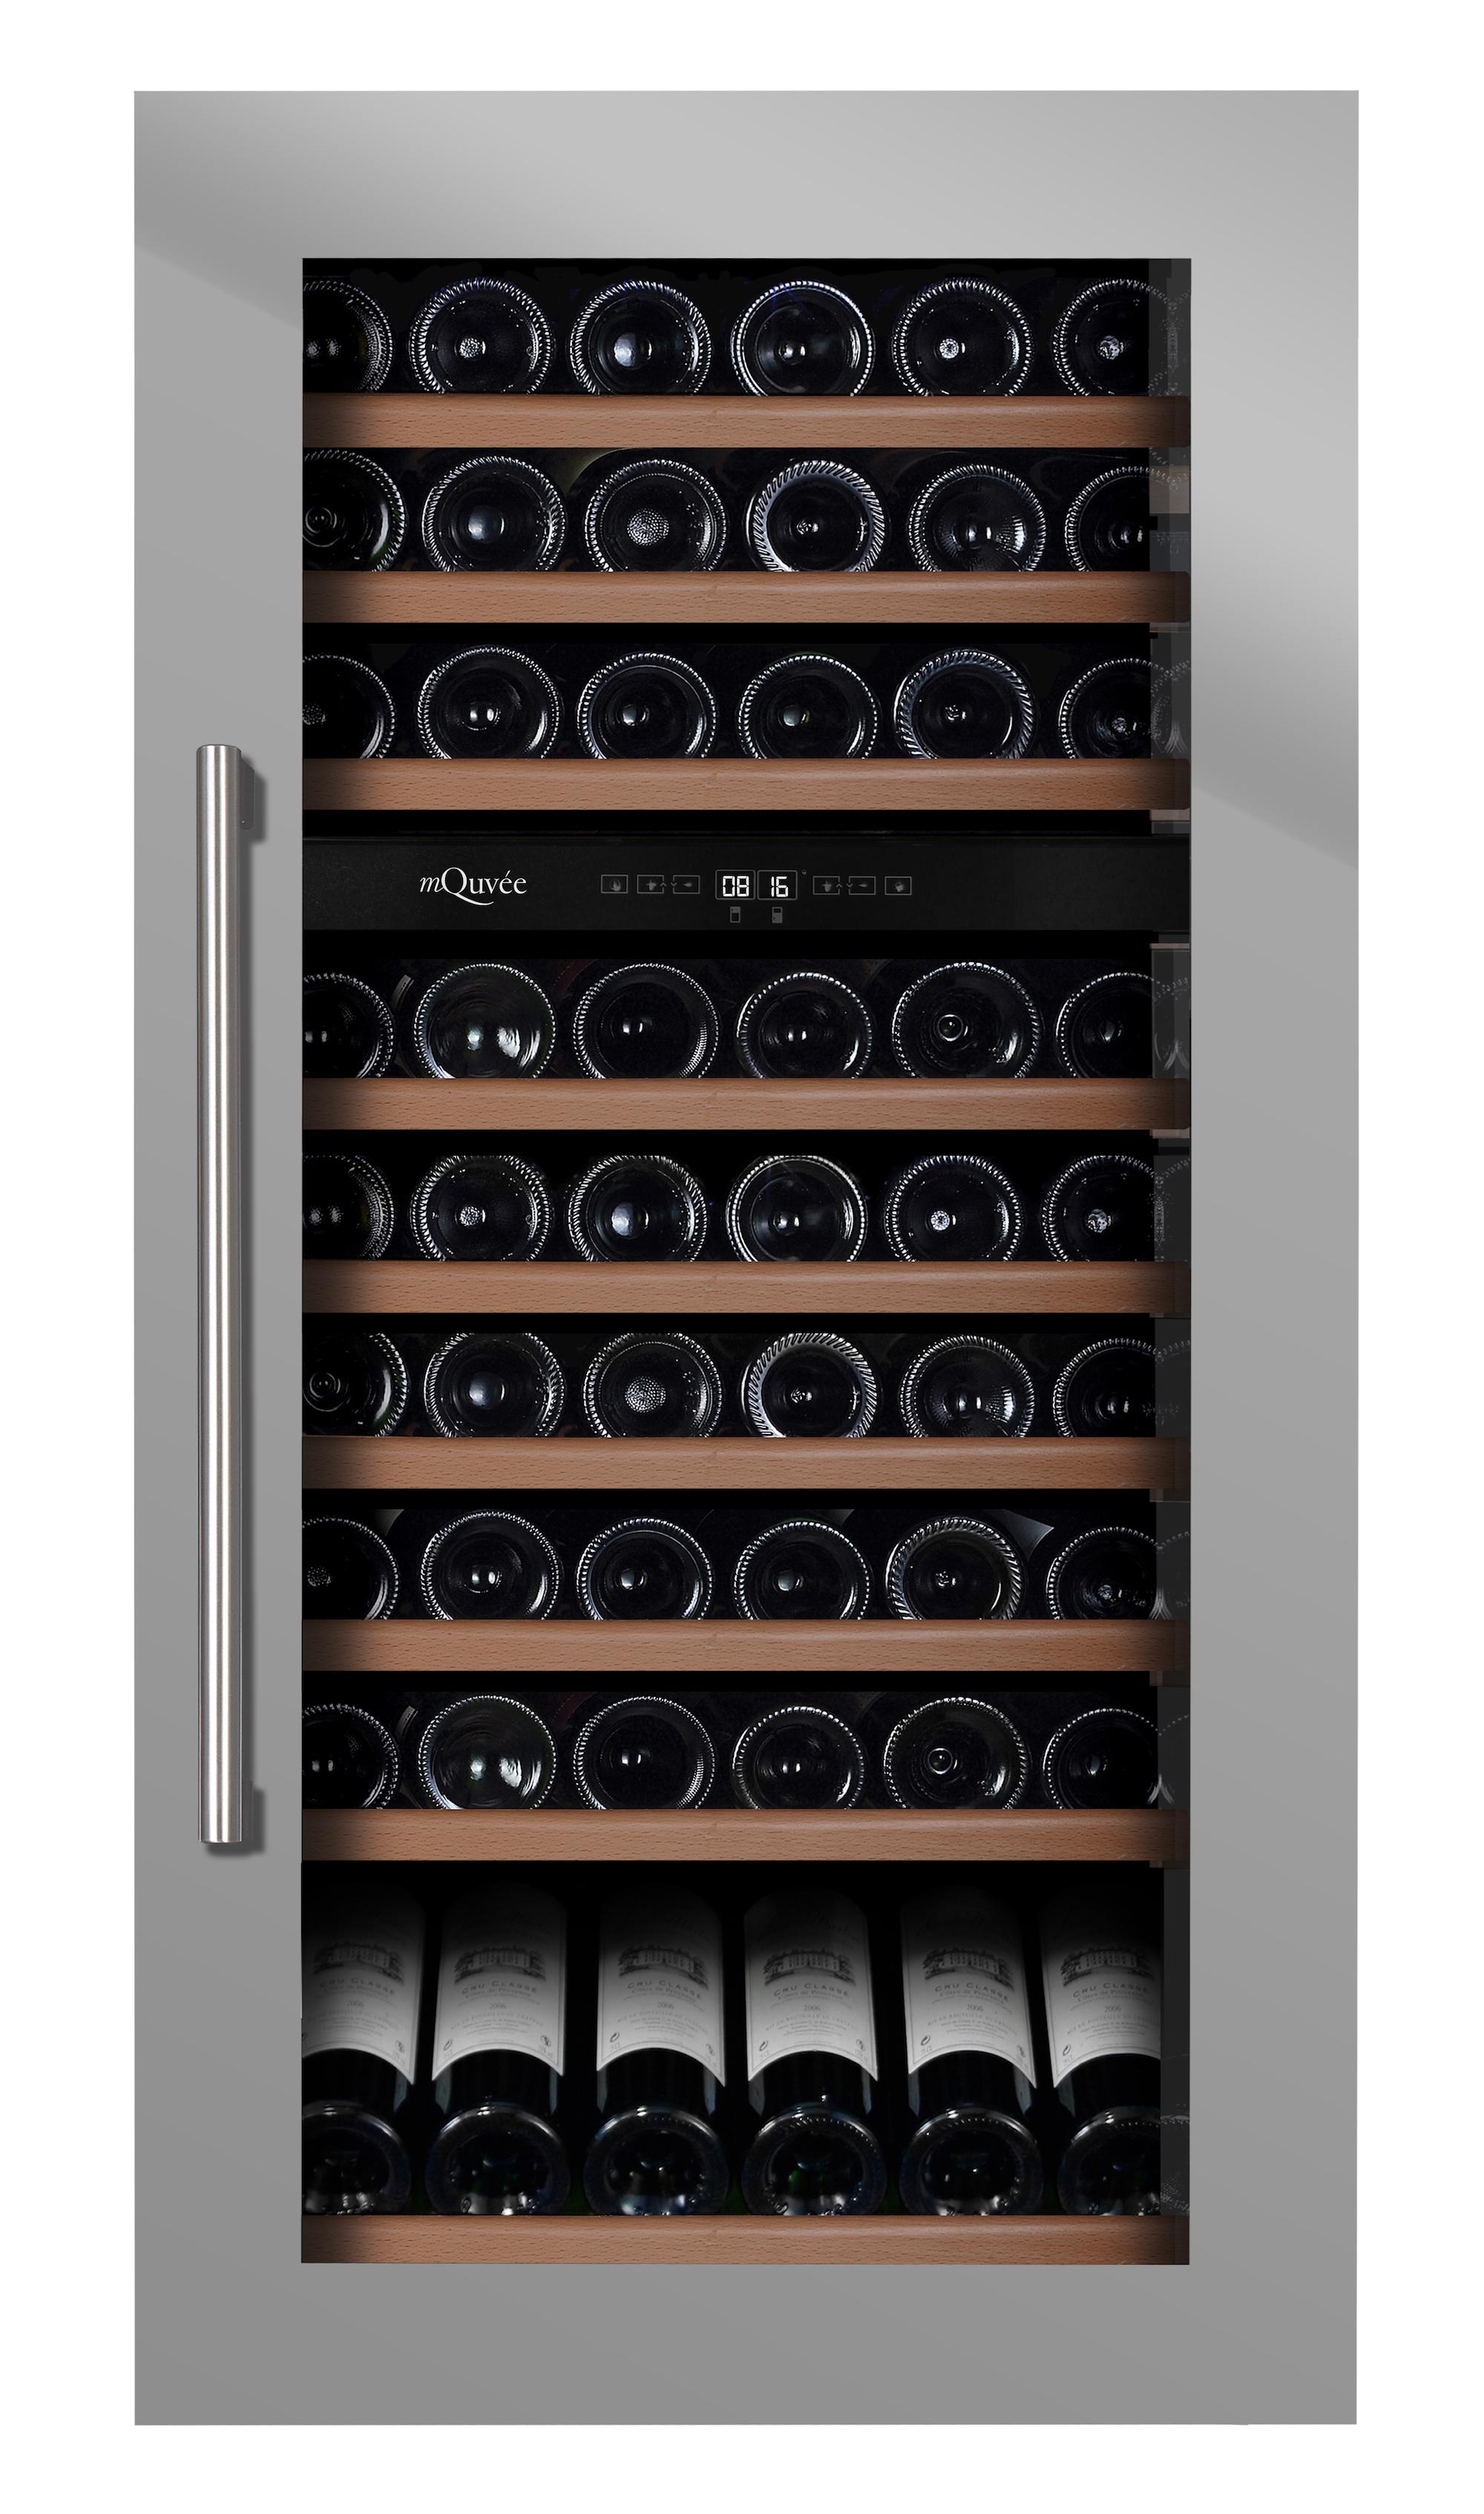 Stilren integrerbar vinkyl i rostfritt som rymmer 87 flaskor